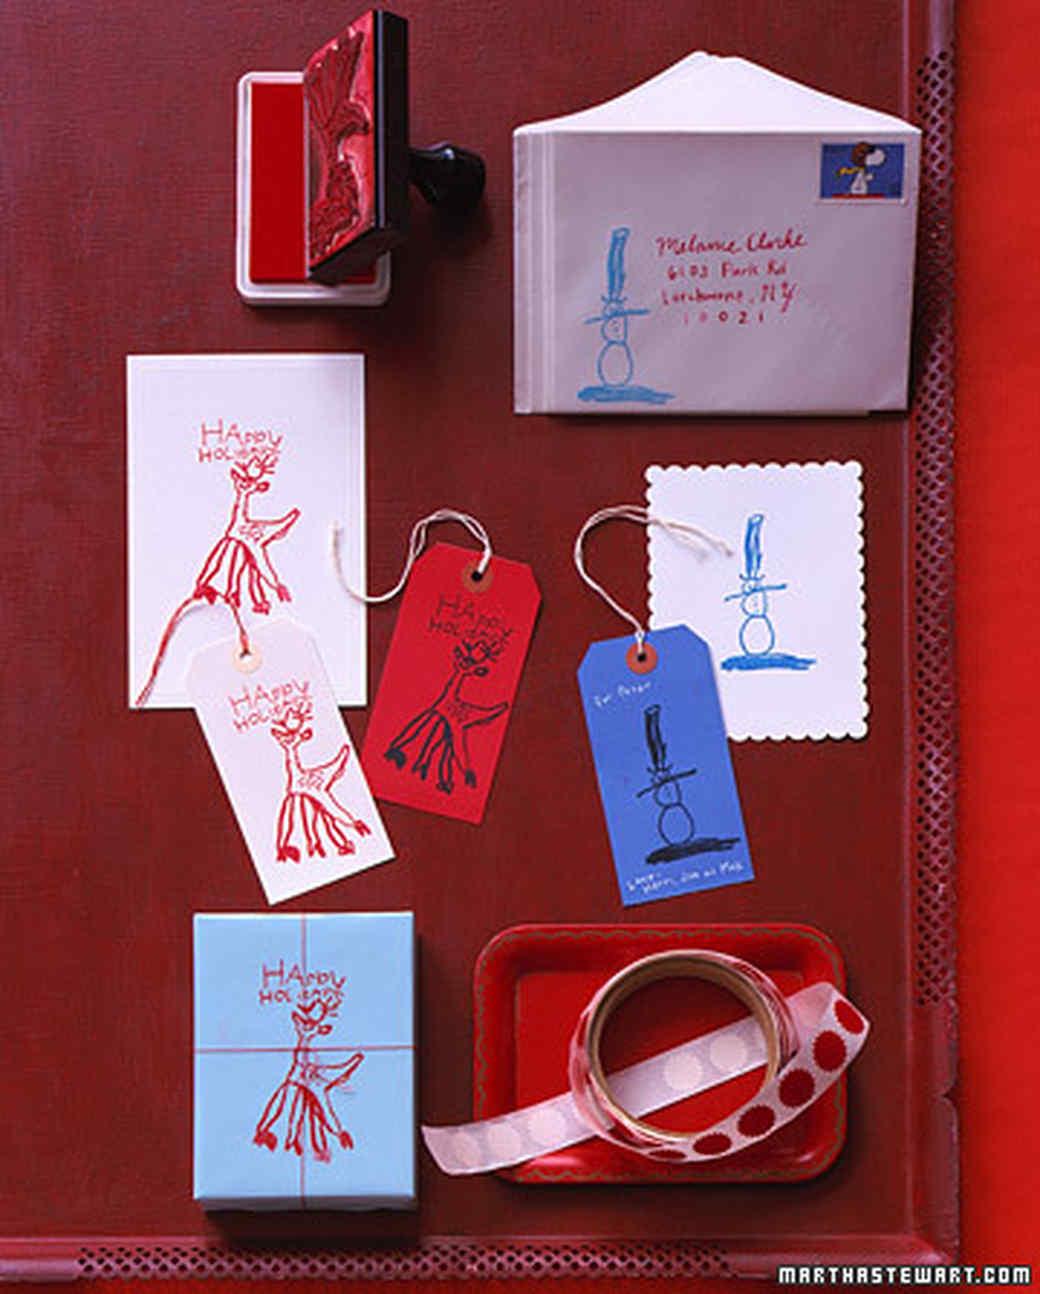 ka98935_hol01_stamps.jpg